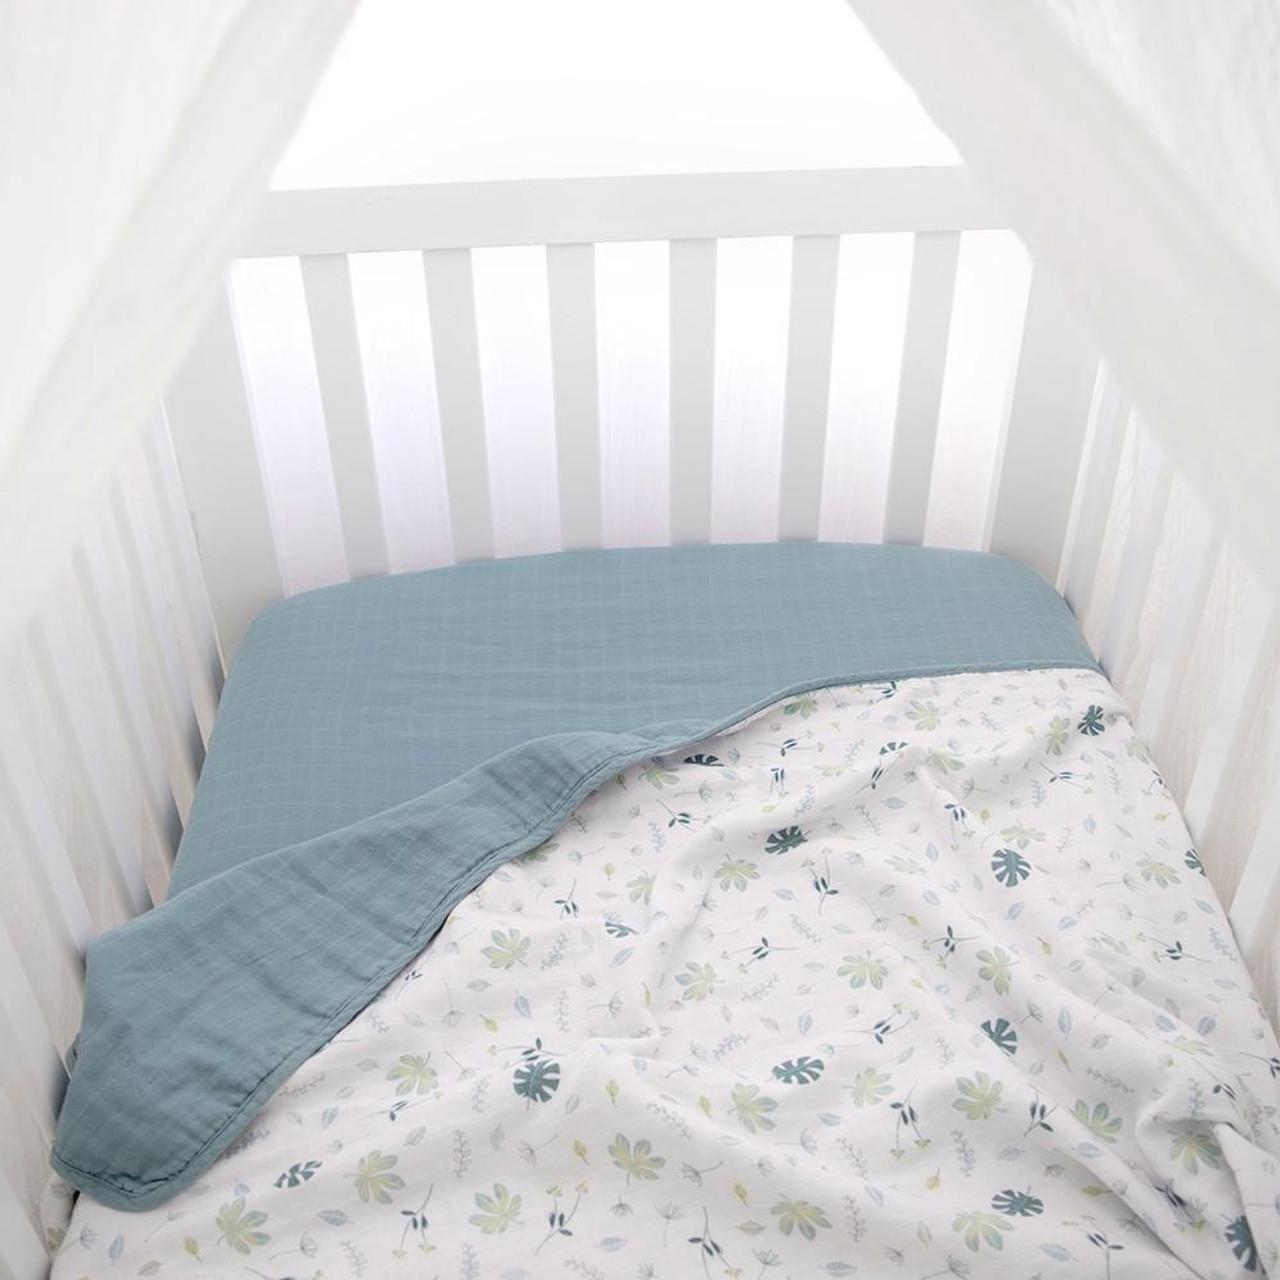 Living Textiles Organic Cotton Muslin Cot Blanket